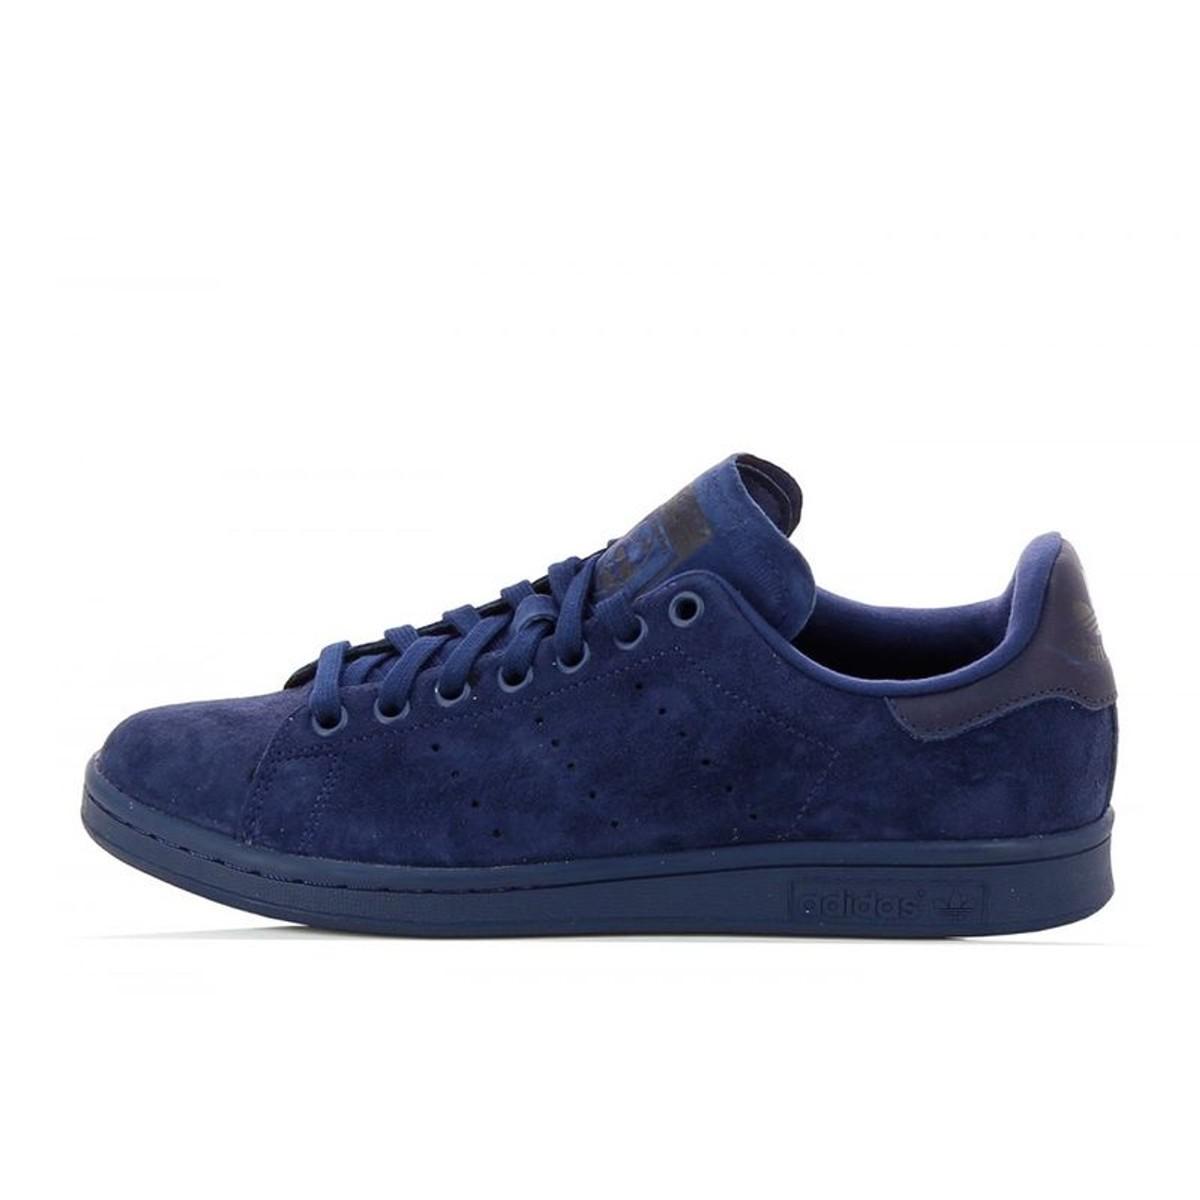 Basket adidas Originals Stan Smith S75107 | Products